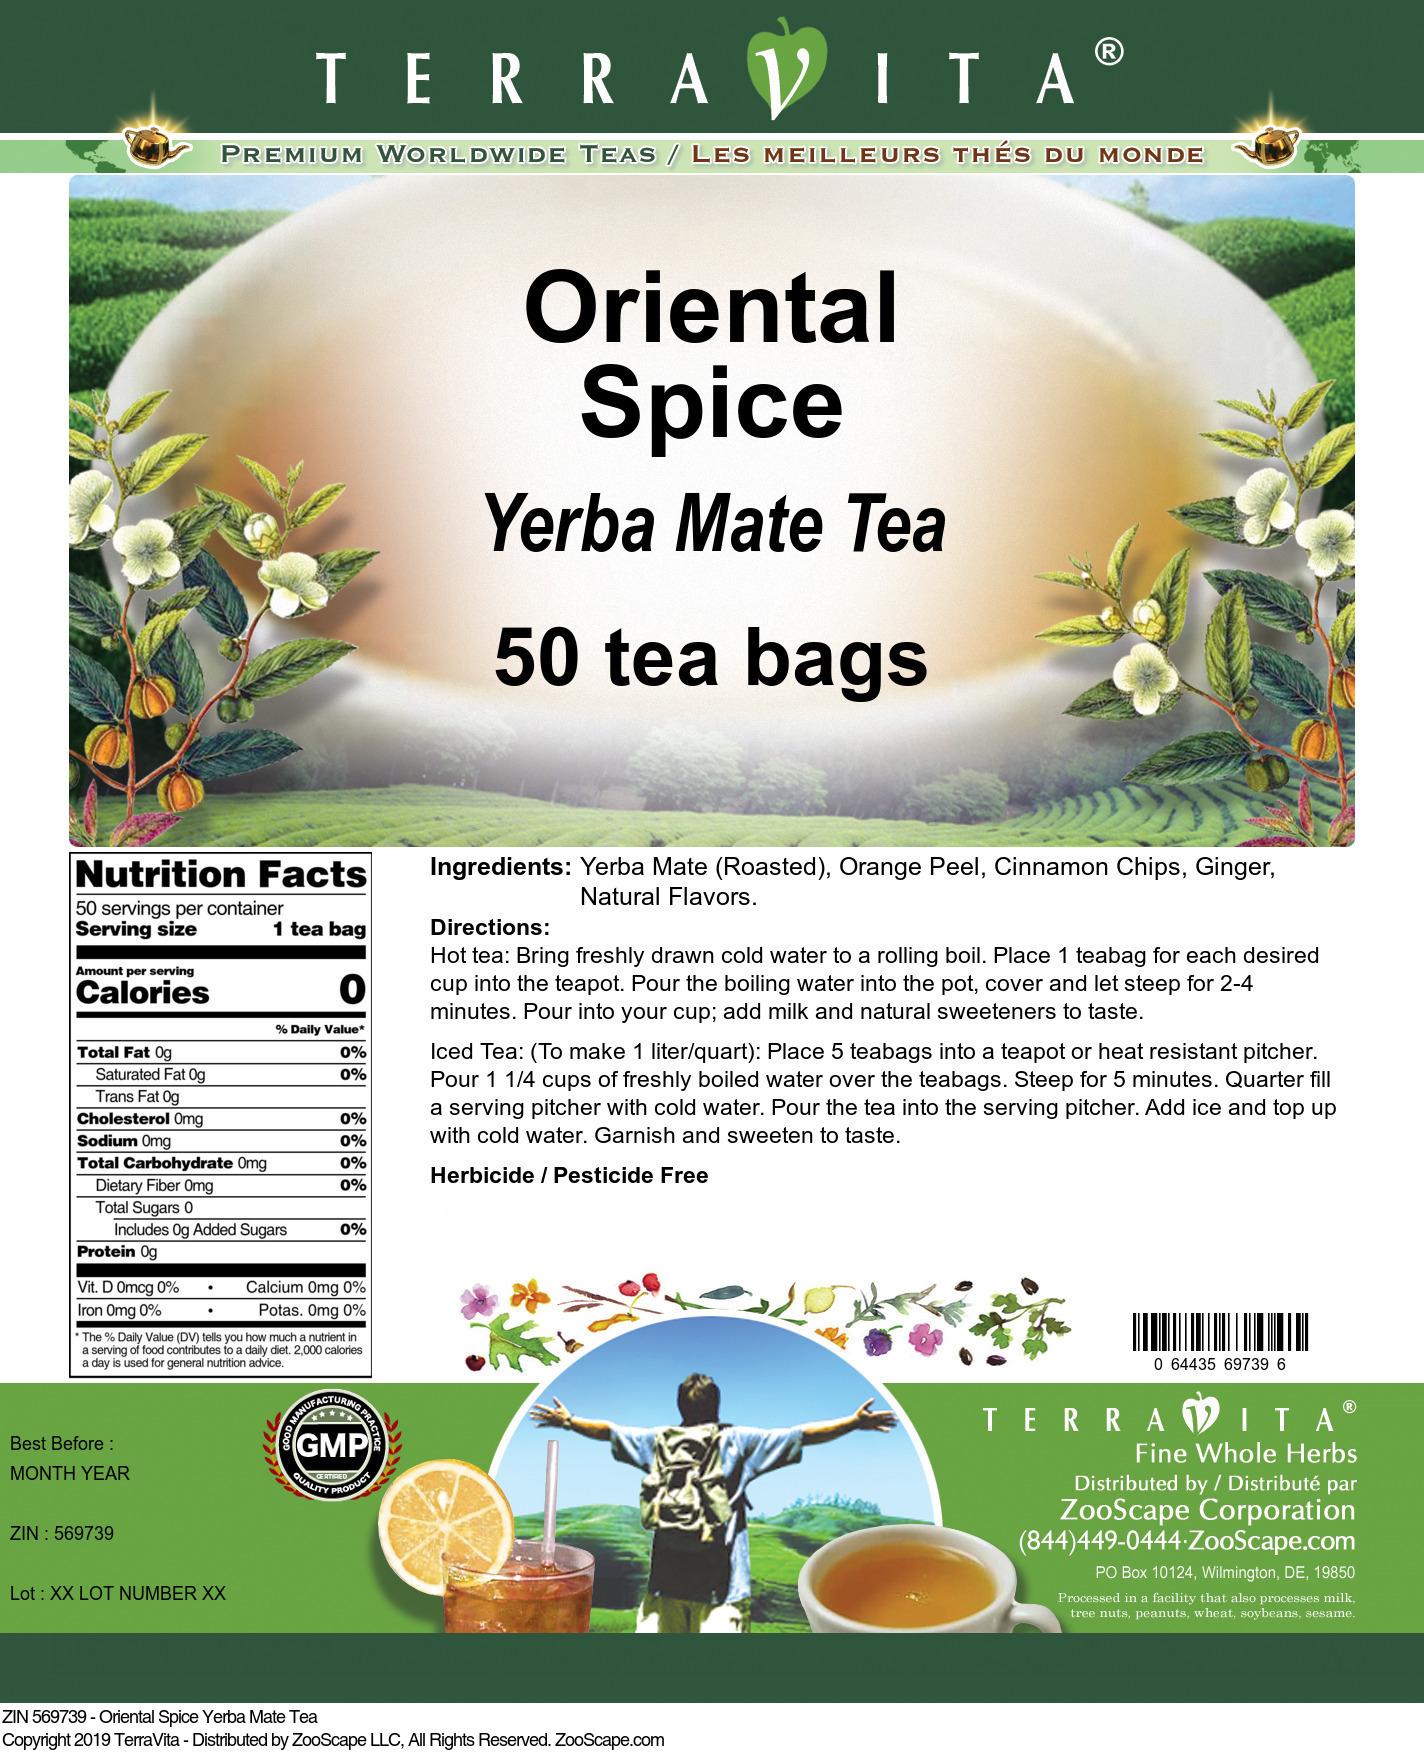 Oriental Spice Yerba Mate